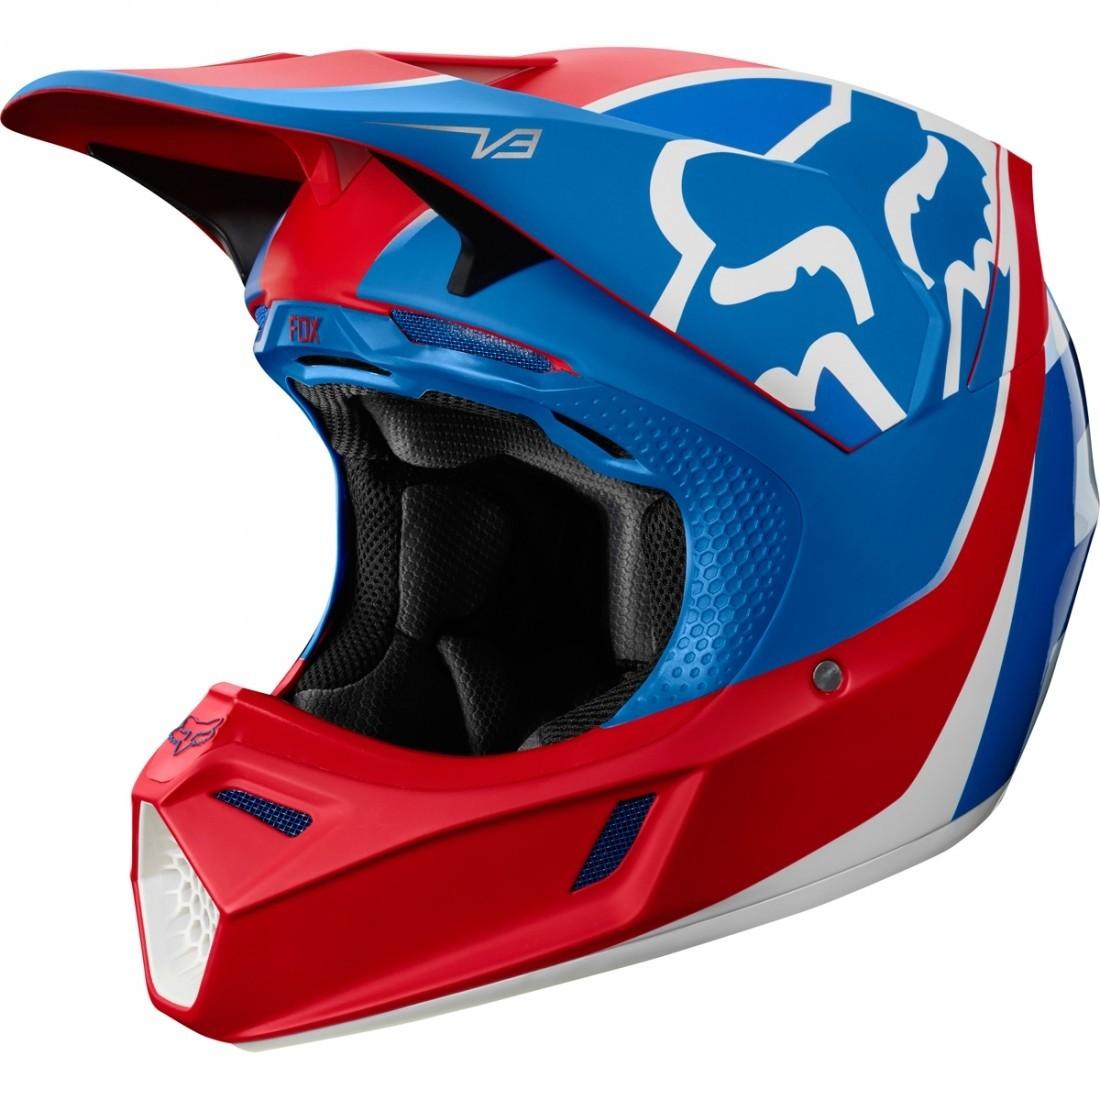 casco fox v3 kila blco/rojo/azul talle m